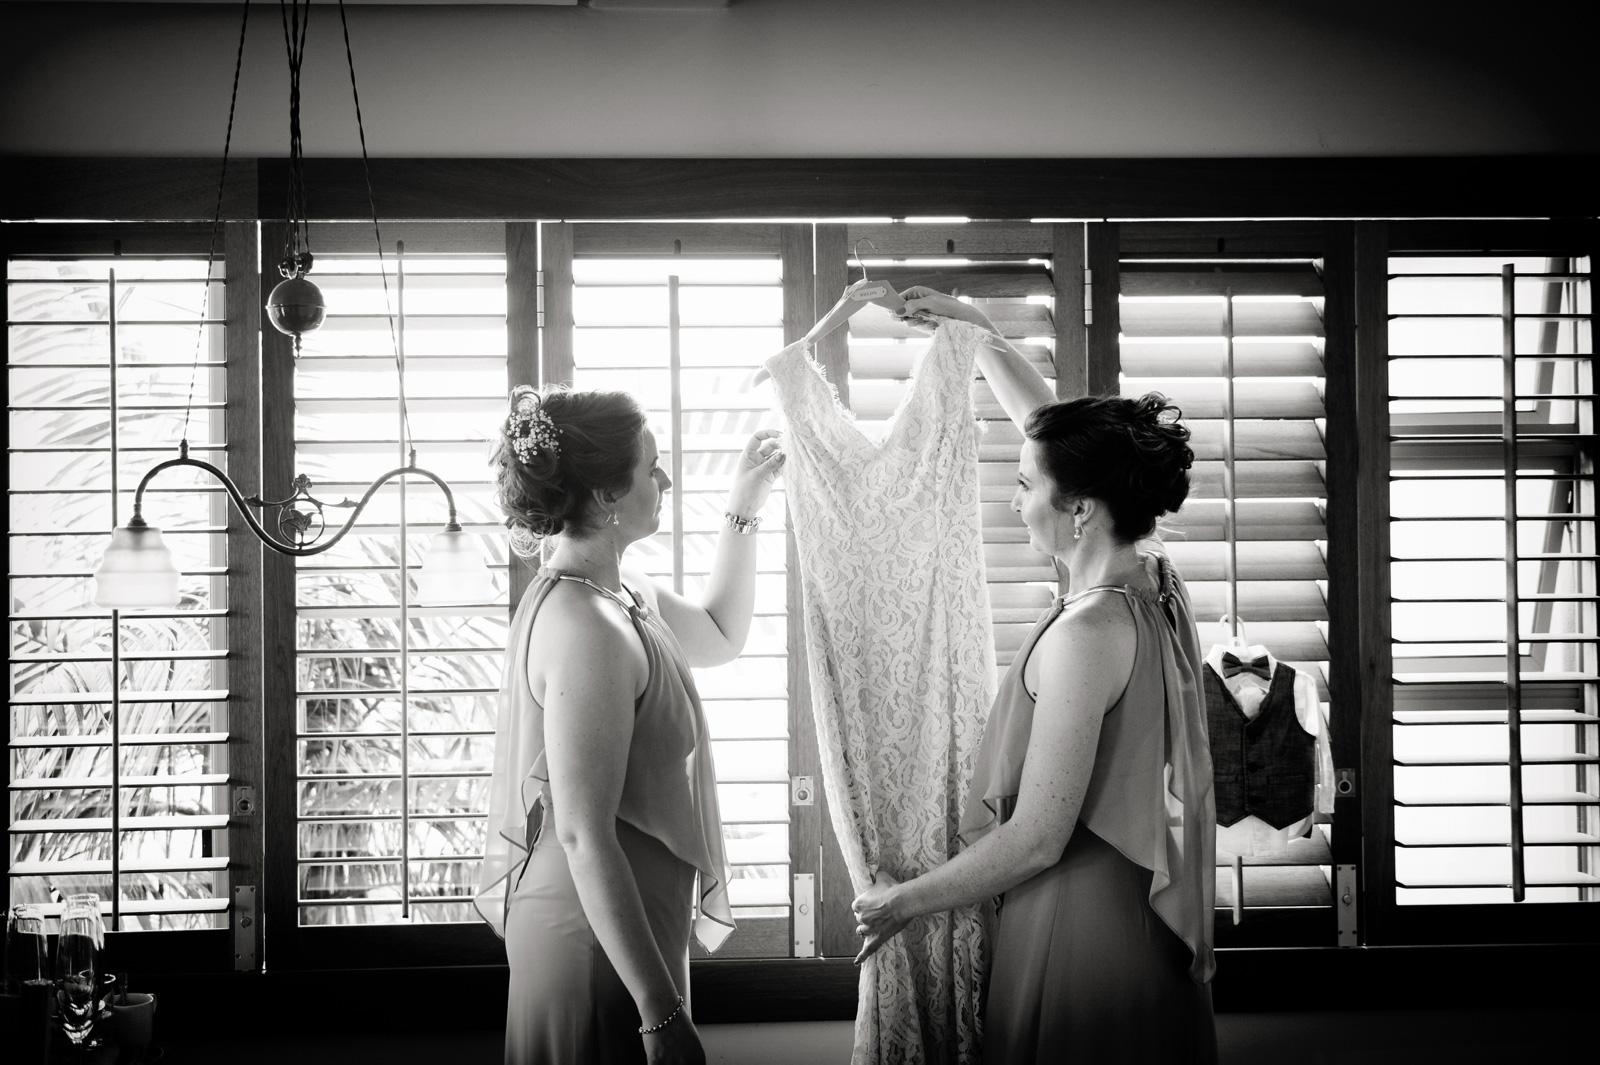 Bridesmaid with wedding dress